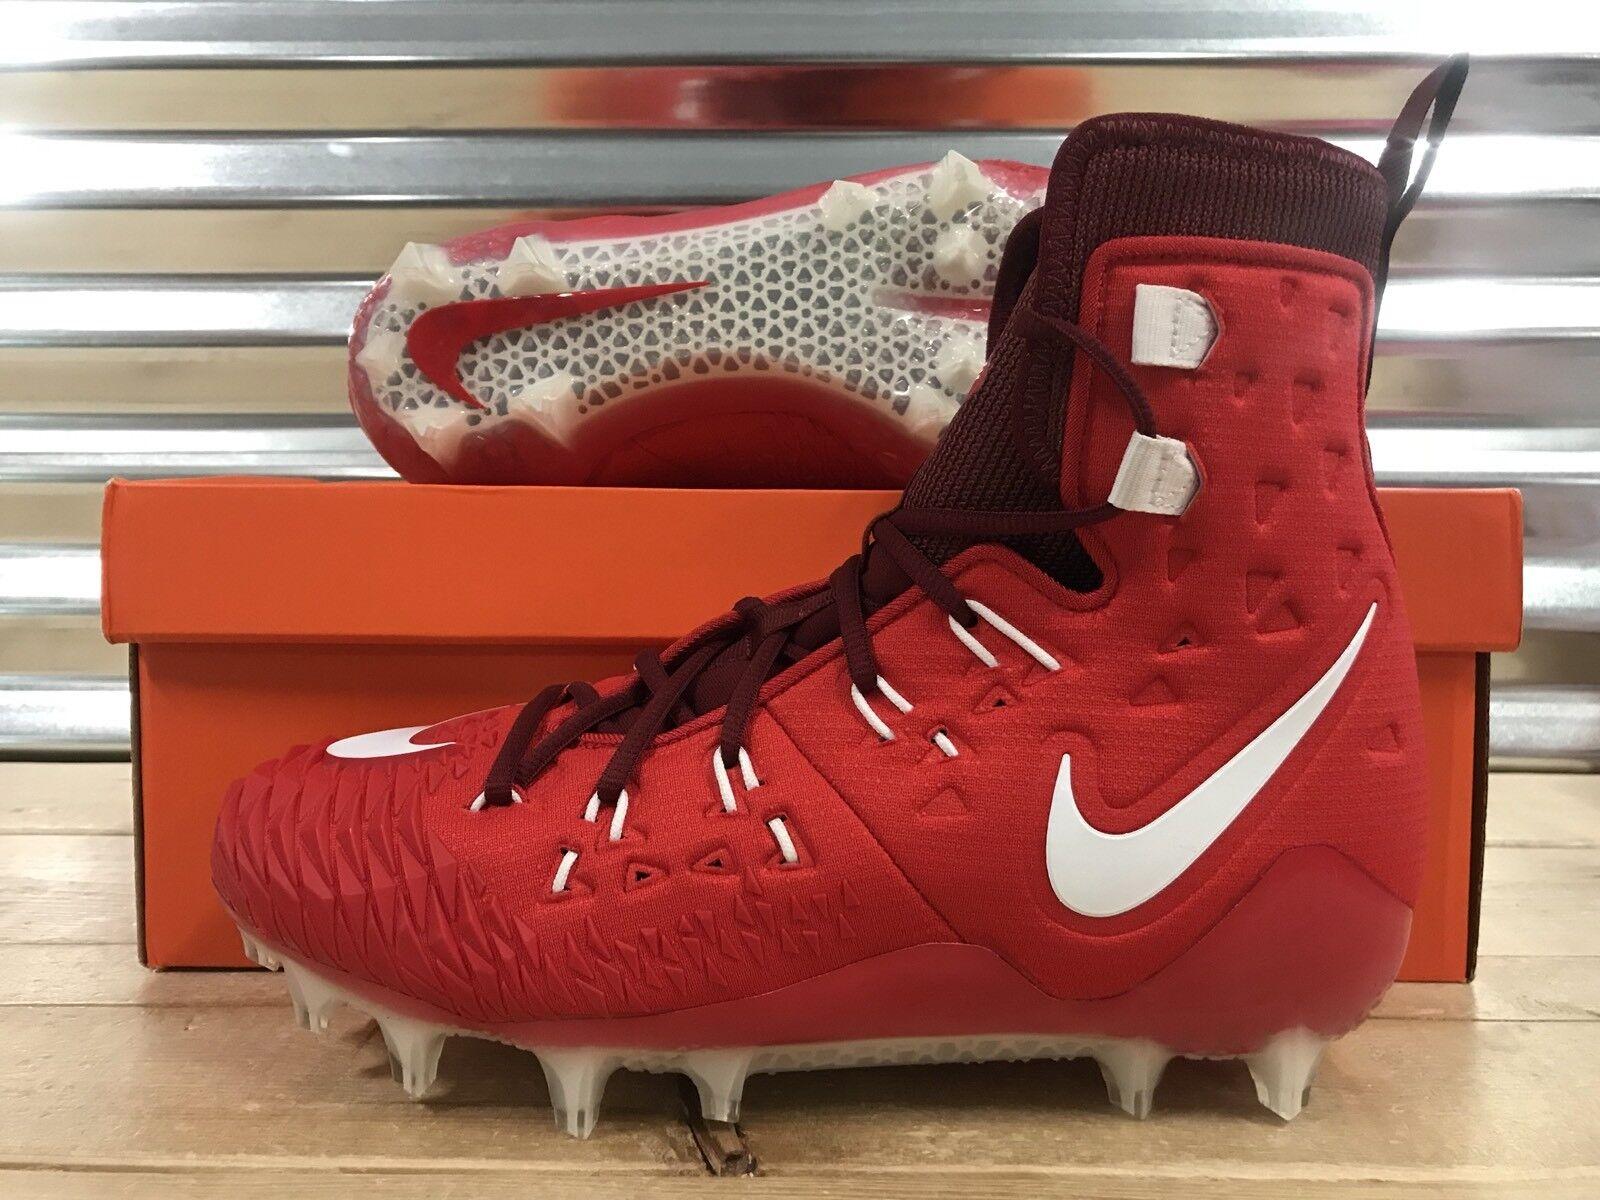 Nike Fuerza Salvaje Elite Td lineman Fútbol (857063-616) Tacos Rojo Blanco Talla (857063-616) Fútbol 906b42